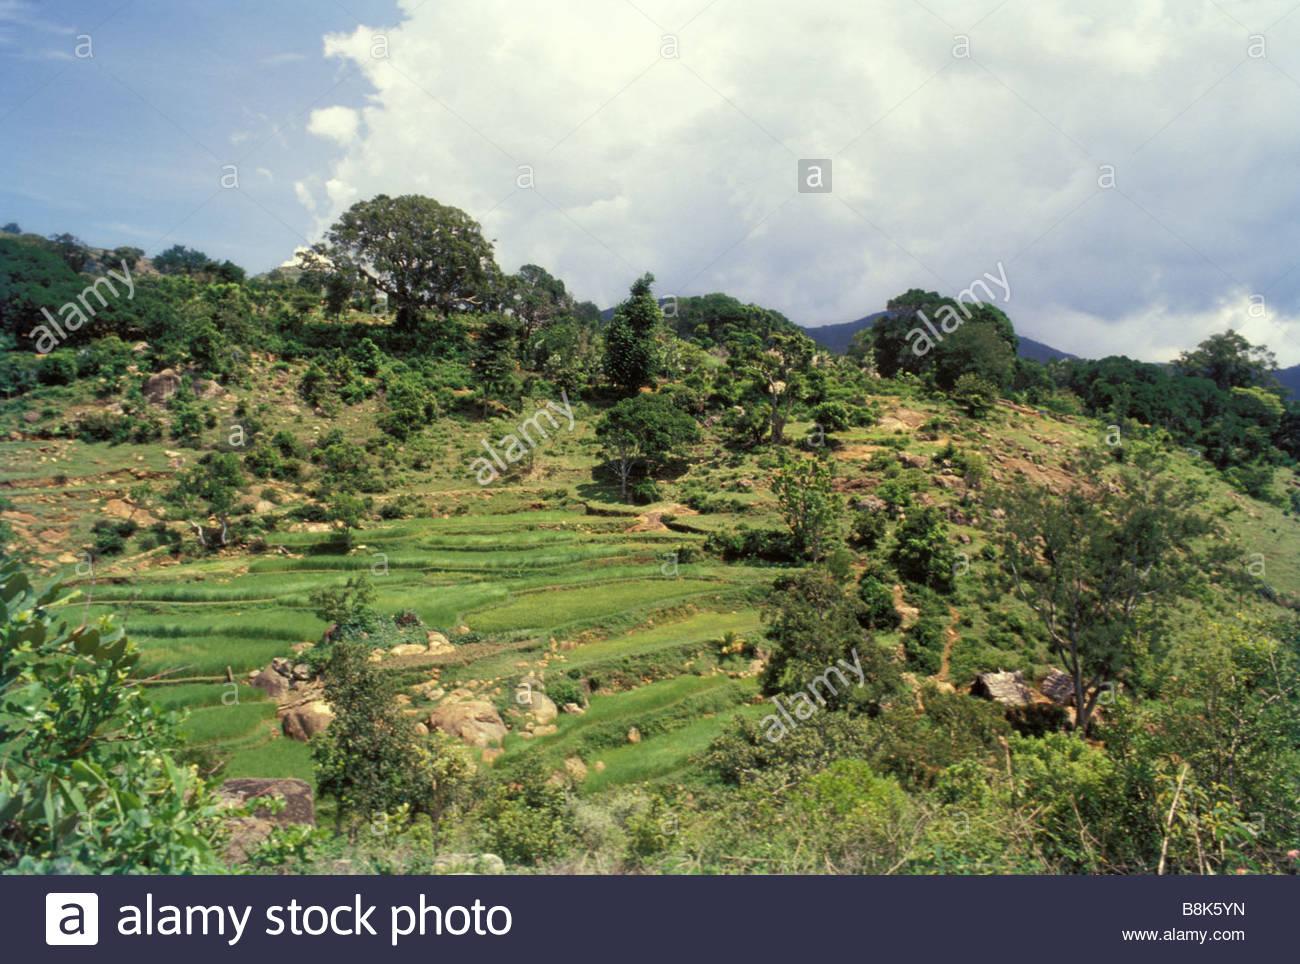 Terrace farming in kolli hills tamilnadu stock photo for Terrace farming in india